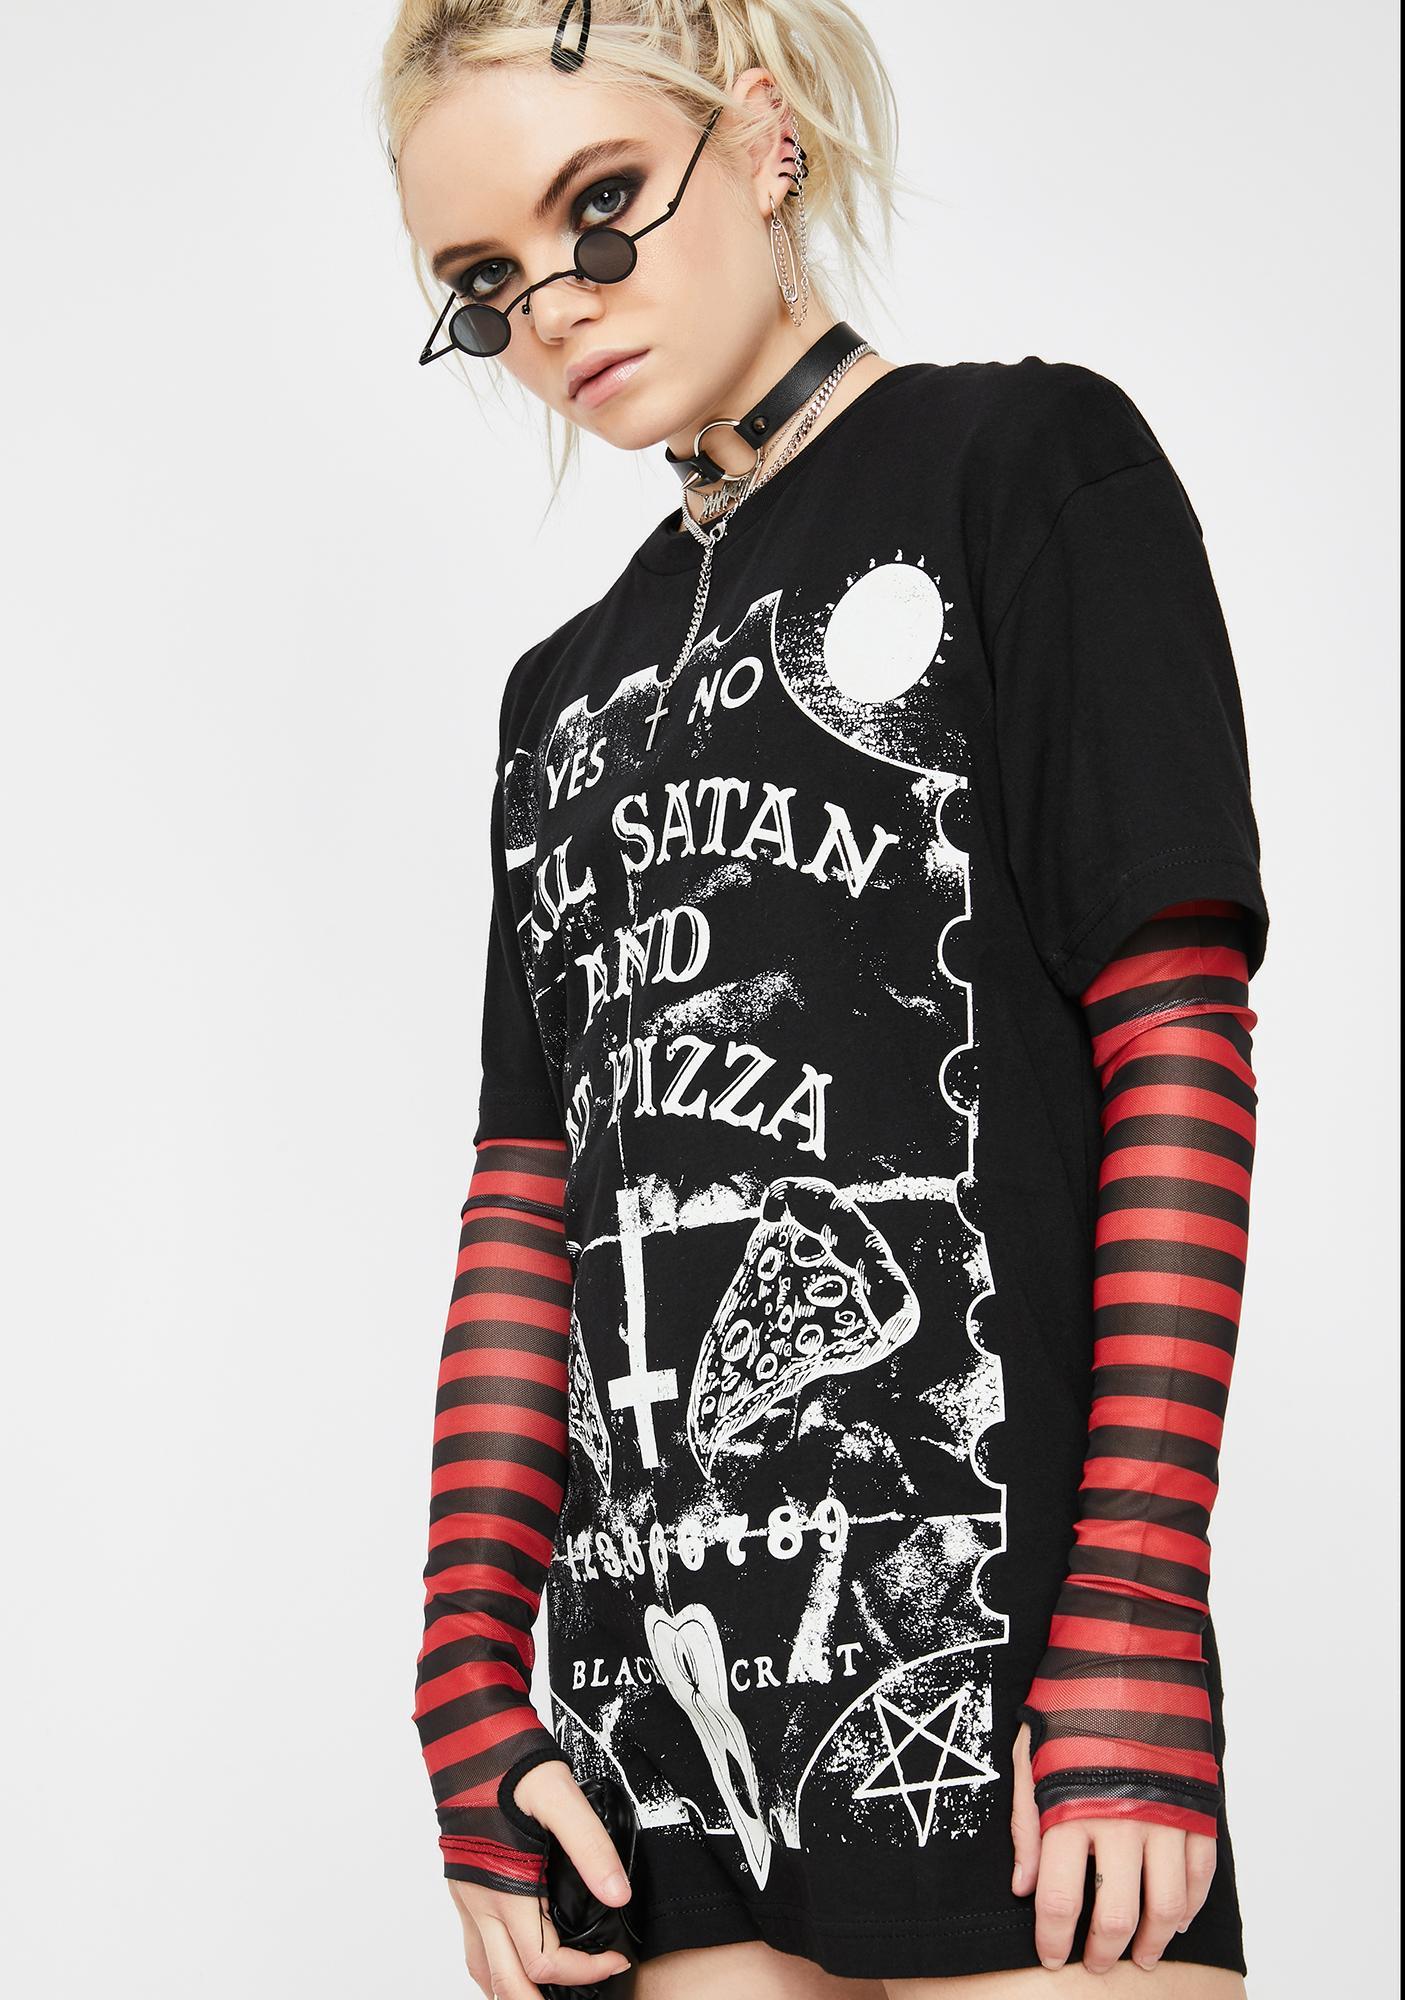 Blackcraft Hail Satan N' Eat Pizza Graphic Tee